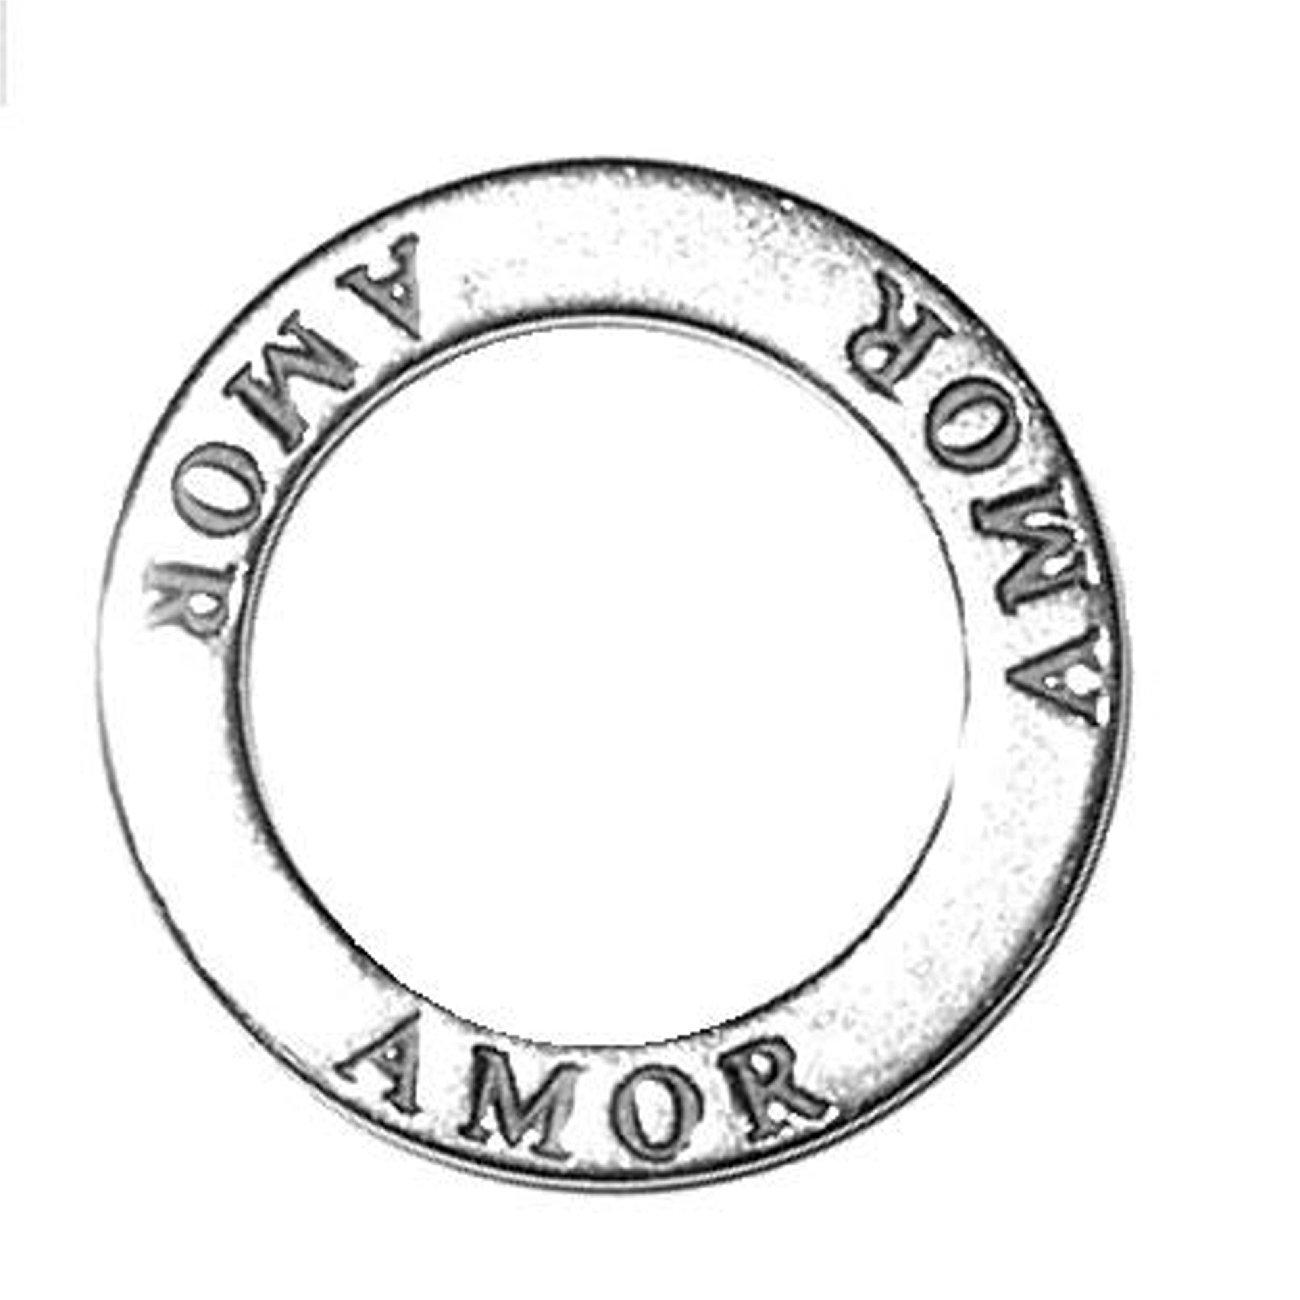 Sterling Silver 30'' Men's 1.5mm Two Sided AMOR (LOVE) Circle Shaped Affirmation Slide Pendant Necklace